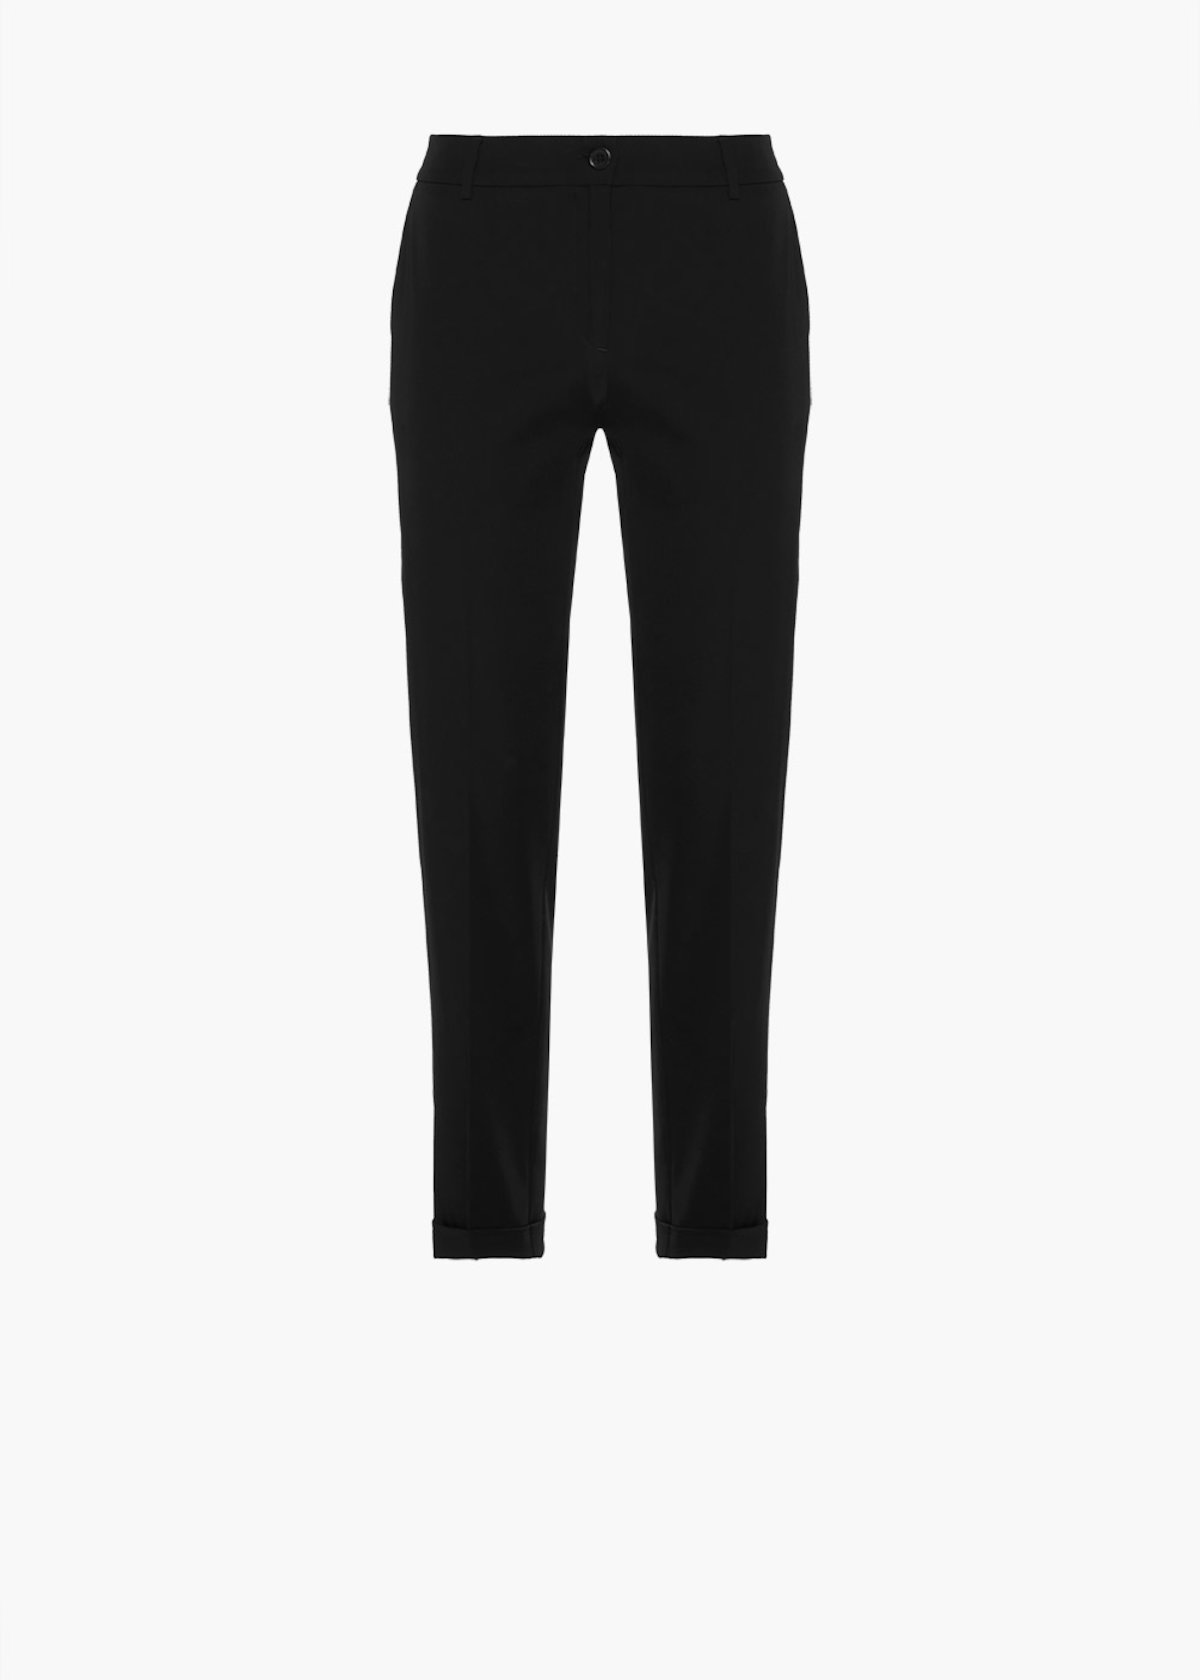 Pants Patrik Scarlett model - Black - Woman - Category image